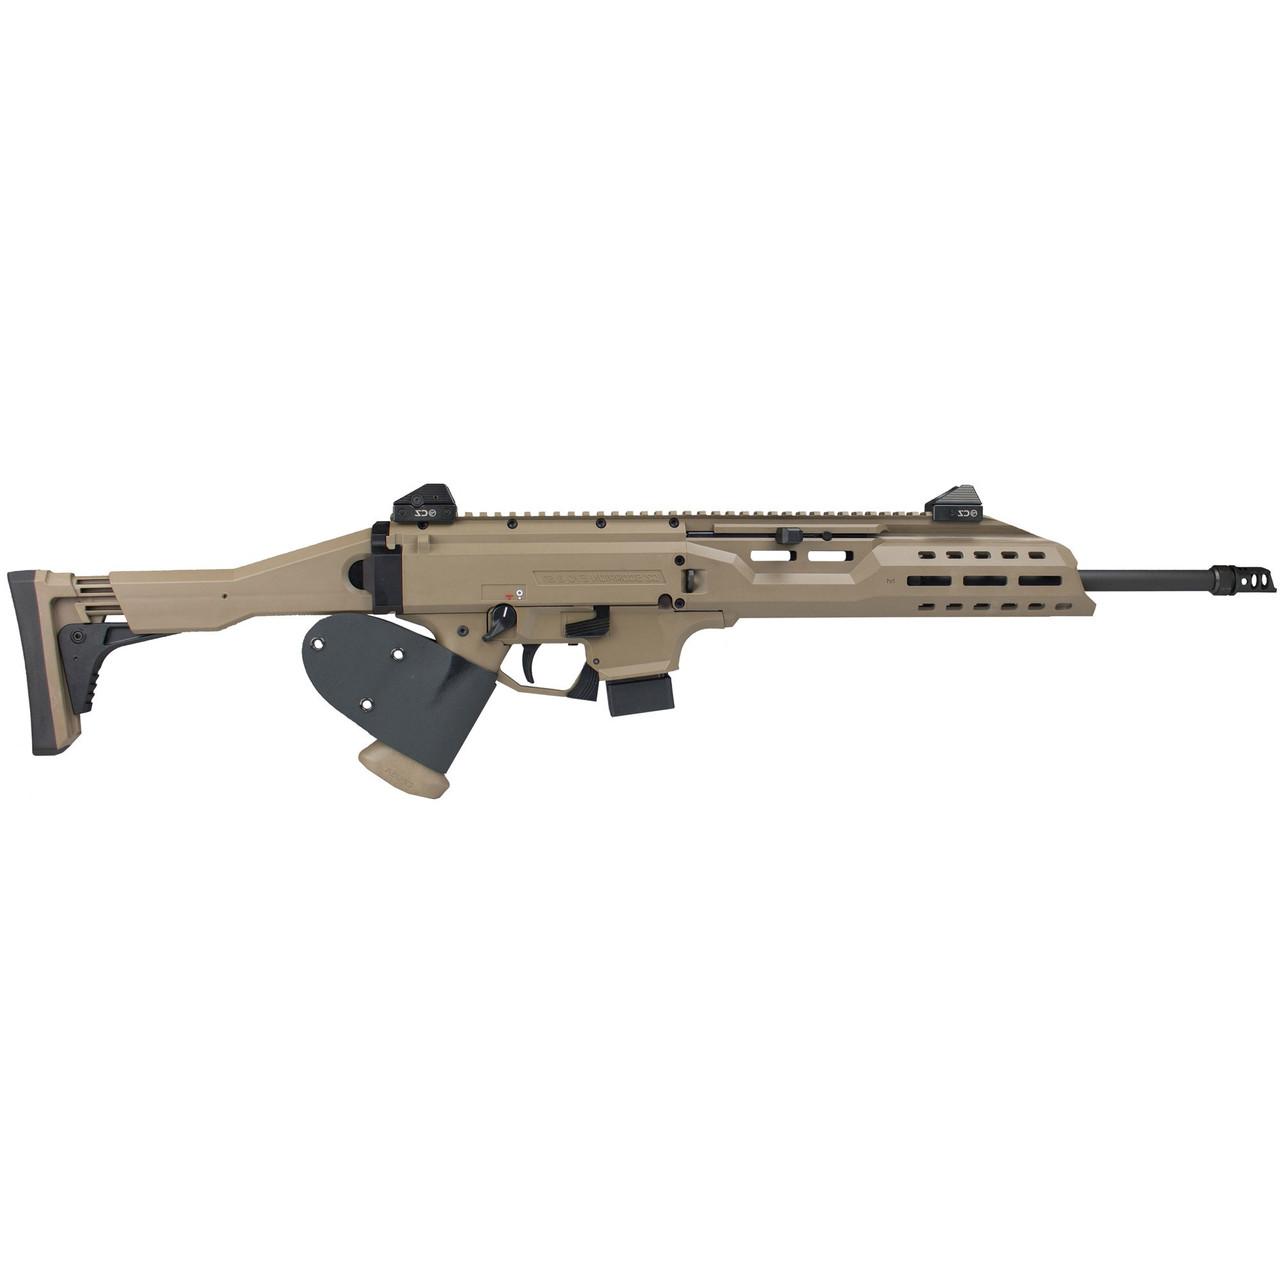 CZ Scorpion EVO 3 S1 Carbine Threaded Barrel FDE CALIFORNIA LEGAL - 9mm